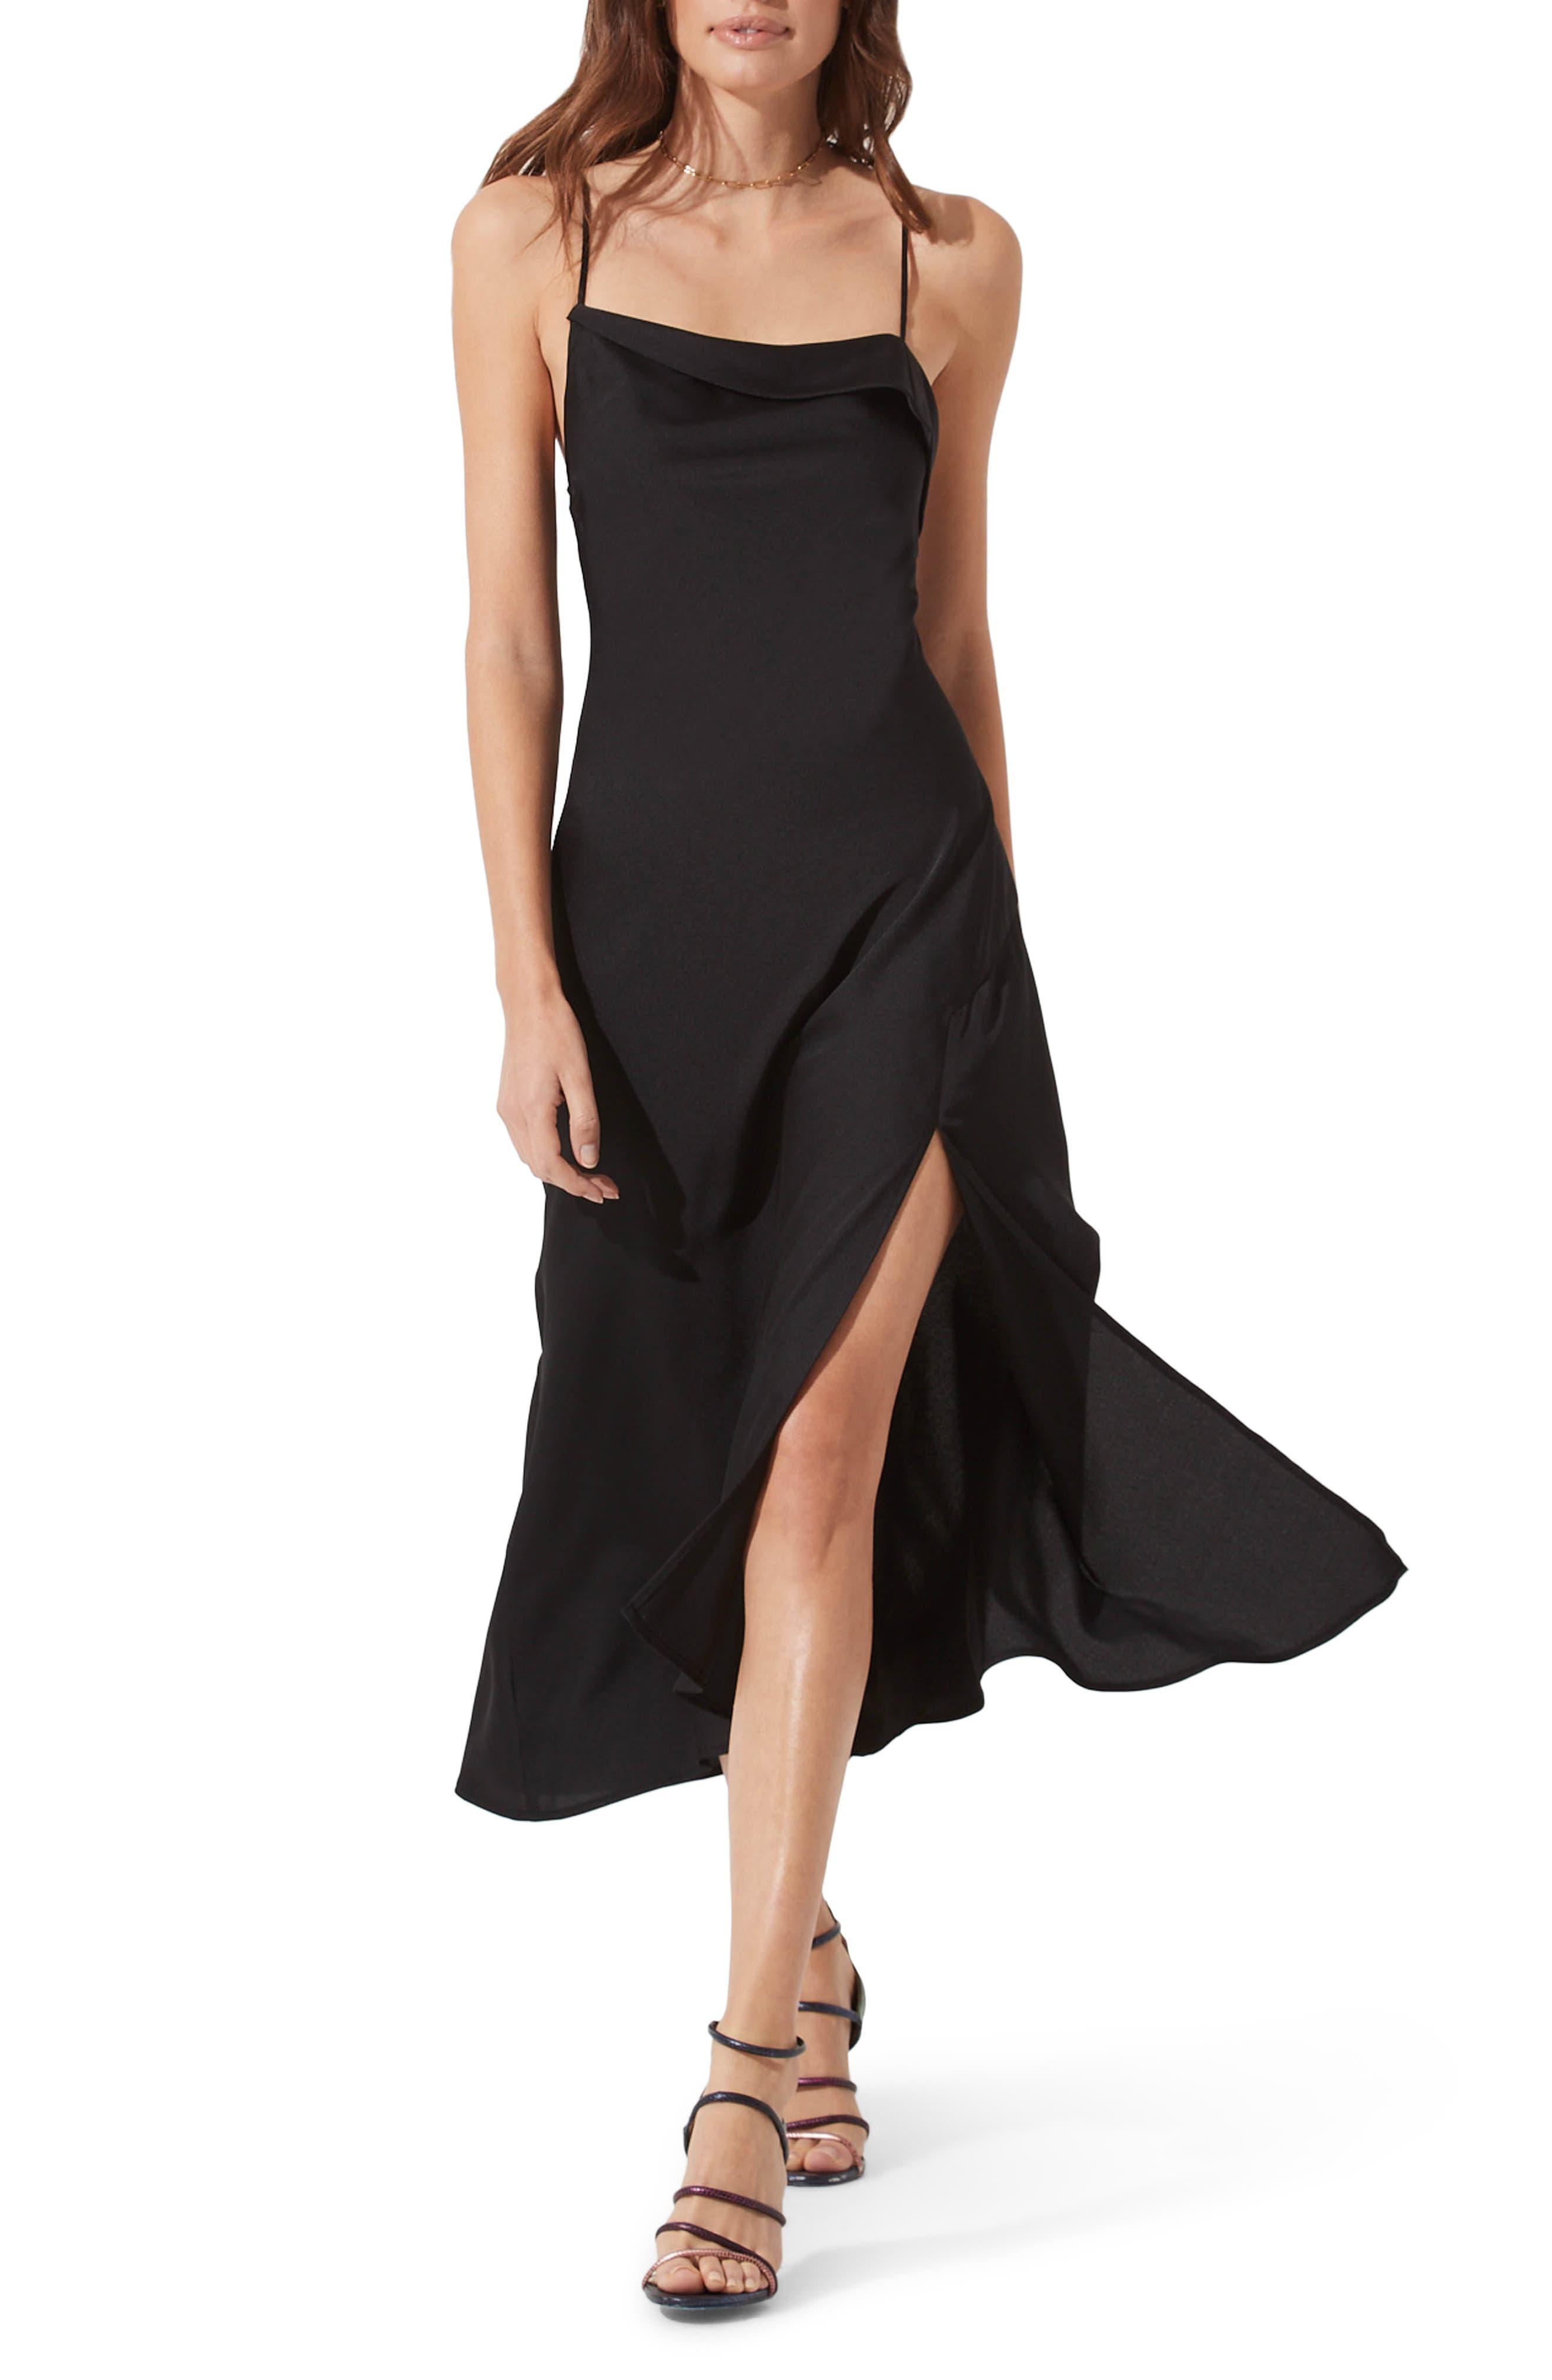 black dress,black dresses for women,Cocktail Dresses for Weddings,Dark Dresses,summer dresses for wedding guest,summer dresses for wedding guest over 50,wedding guest dress summer,